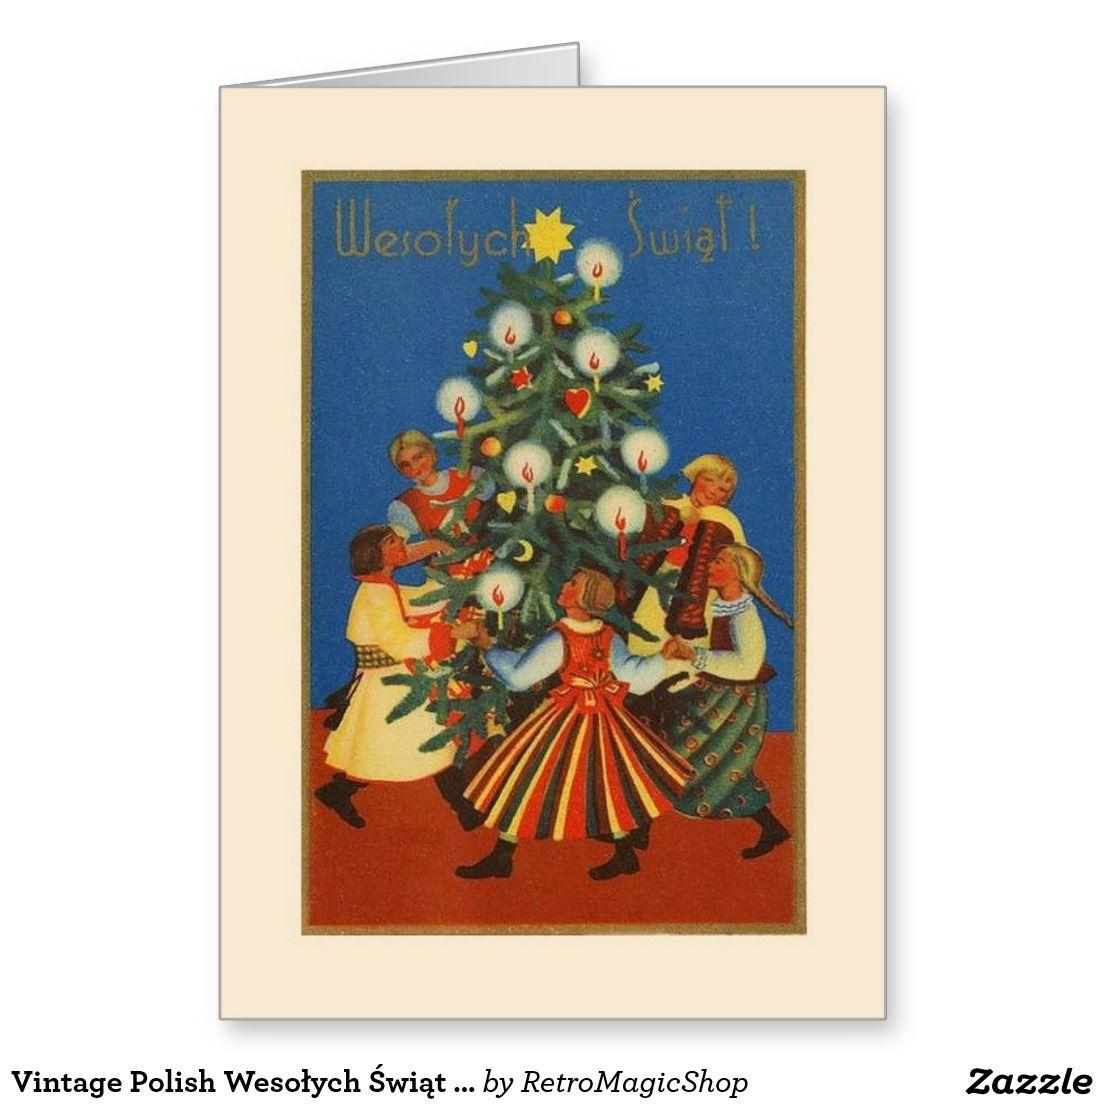 Vintage Polish Wesołych Świąt Christmas Card | Vintage International ...